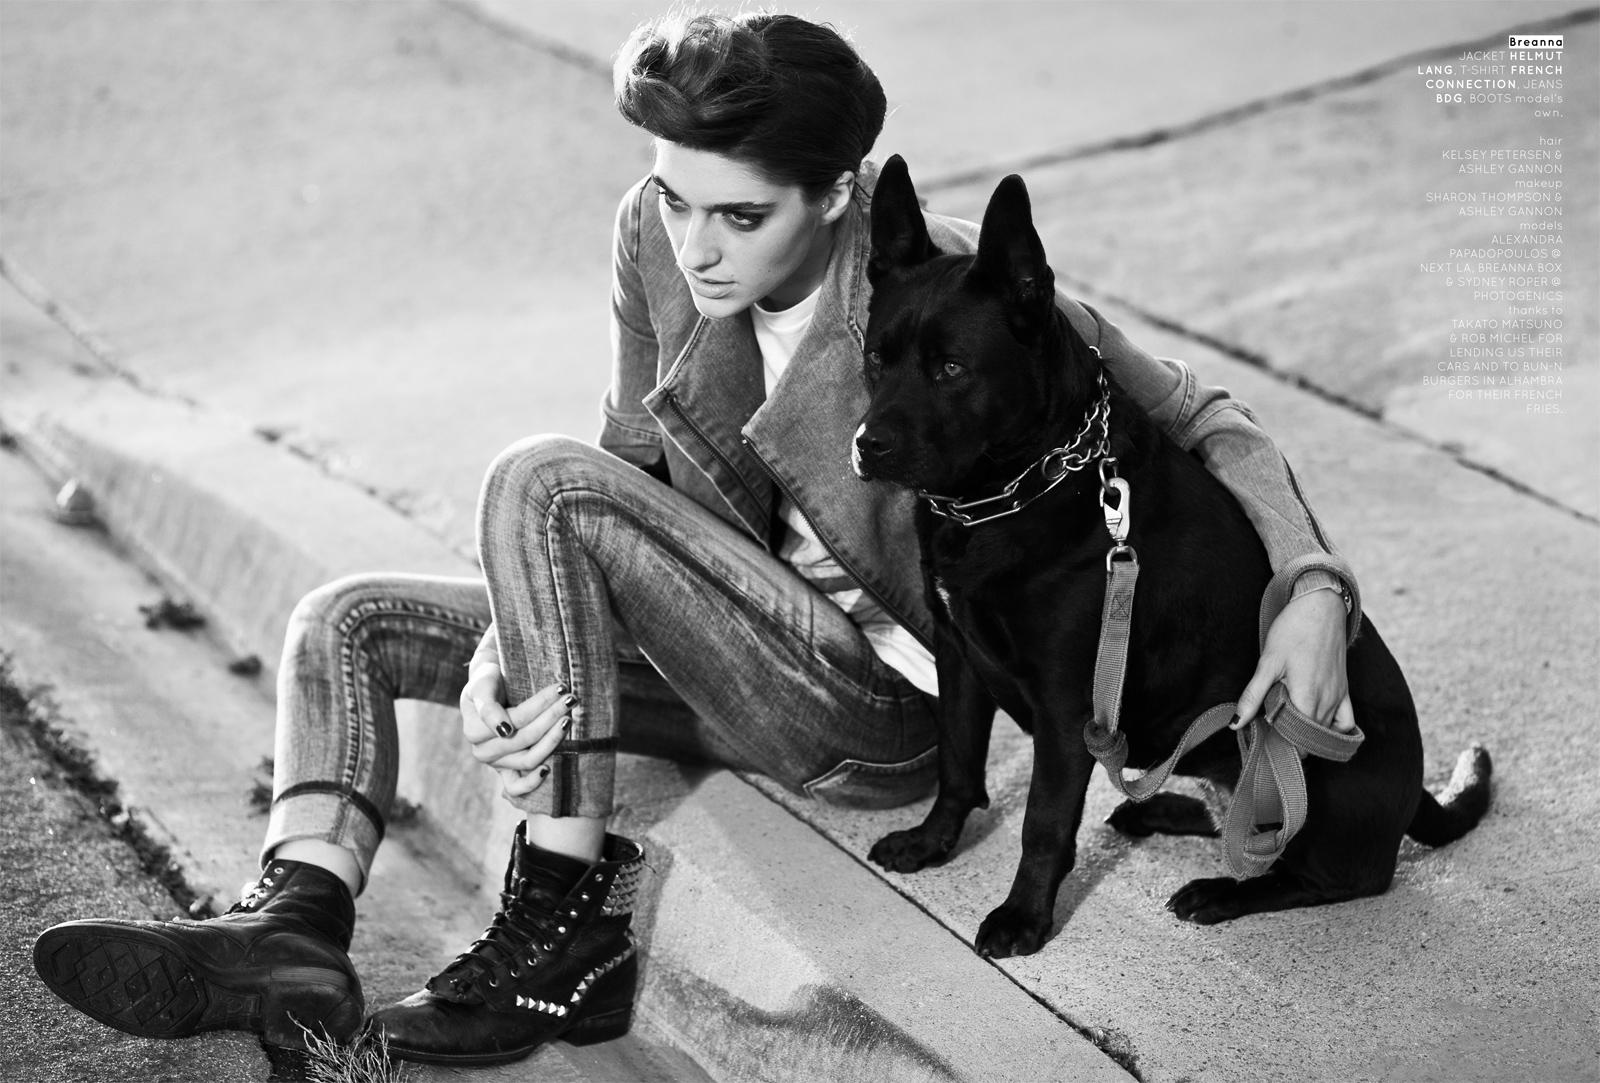 hounddogs-11